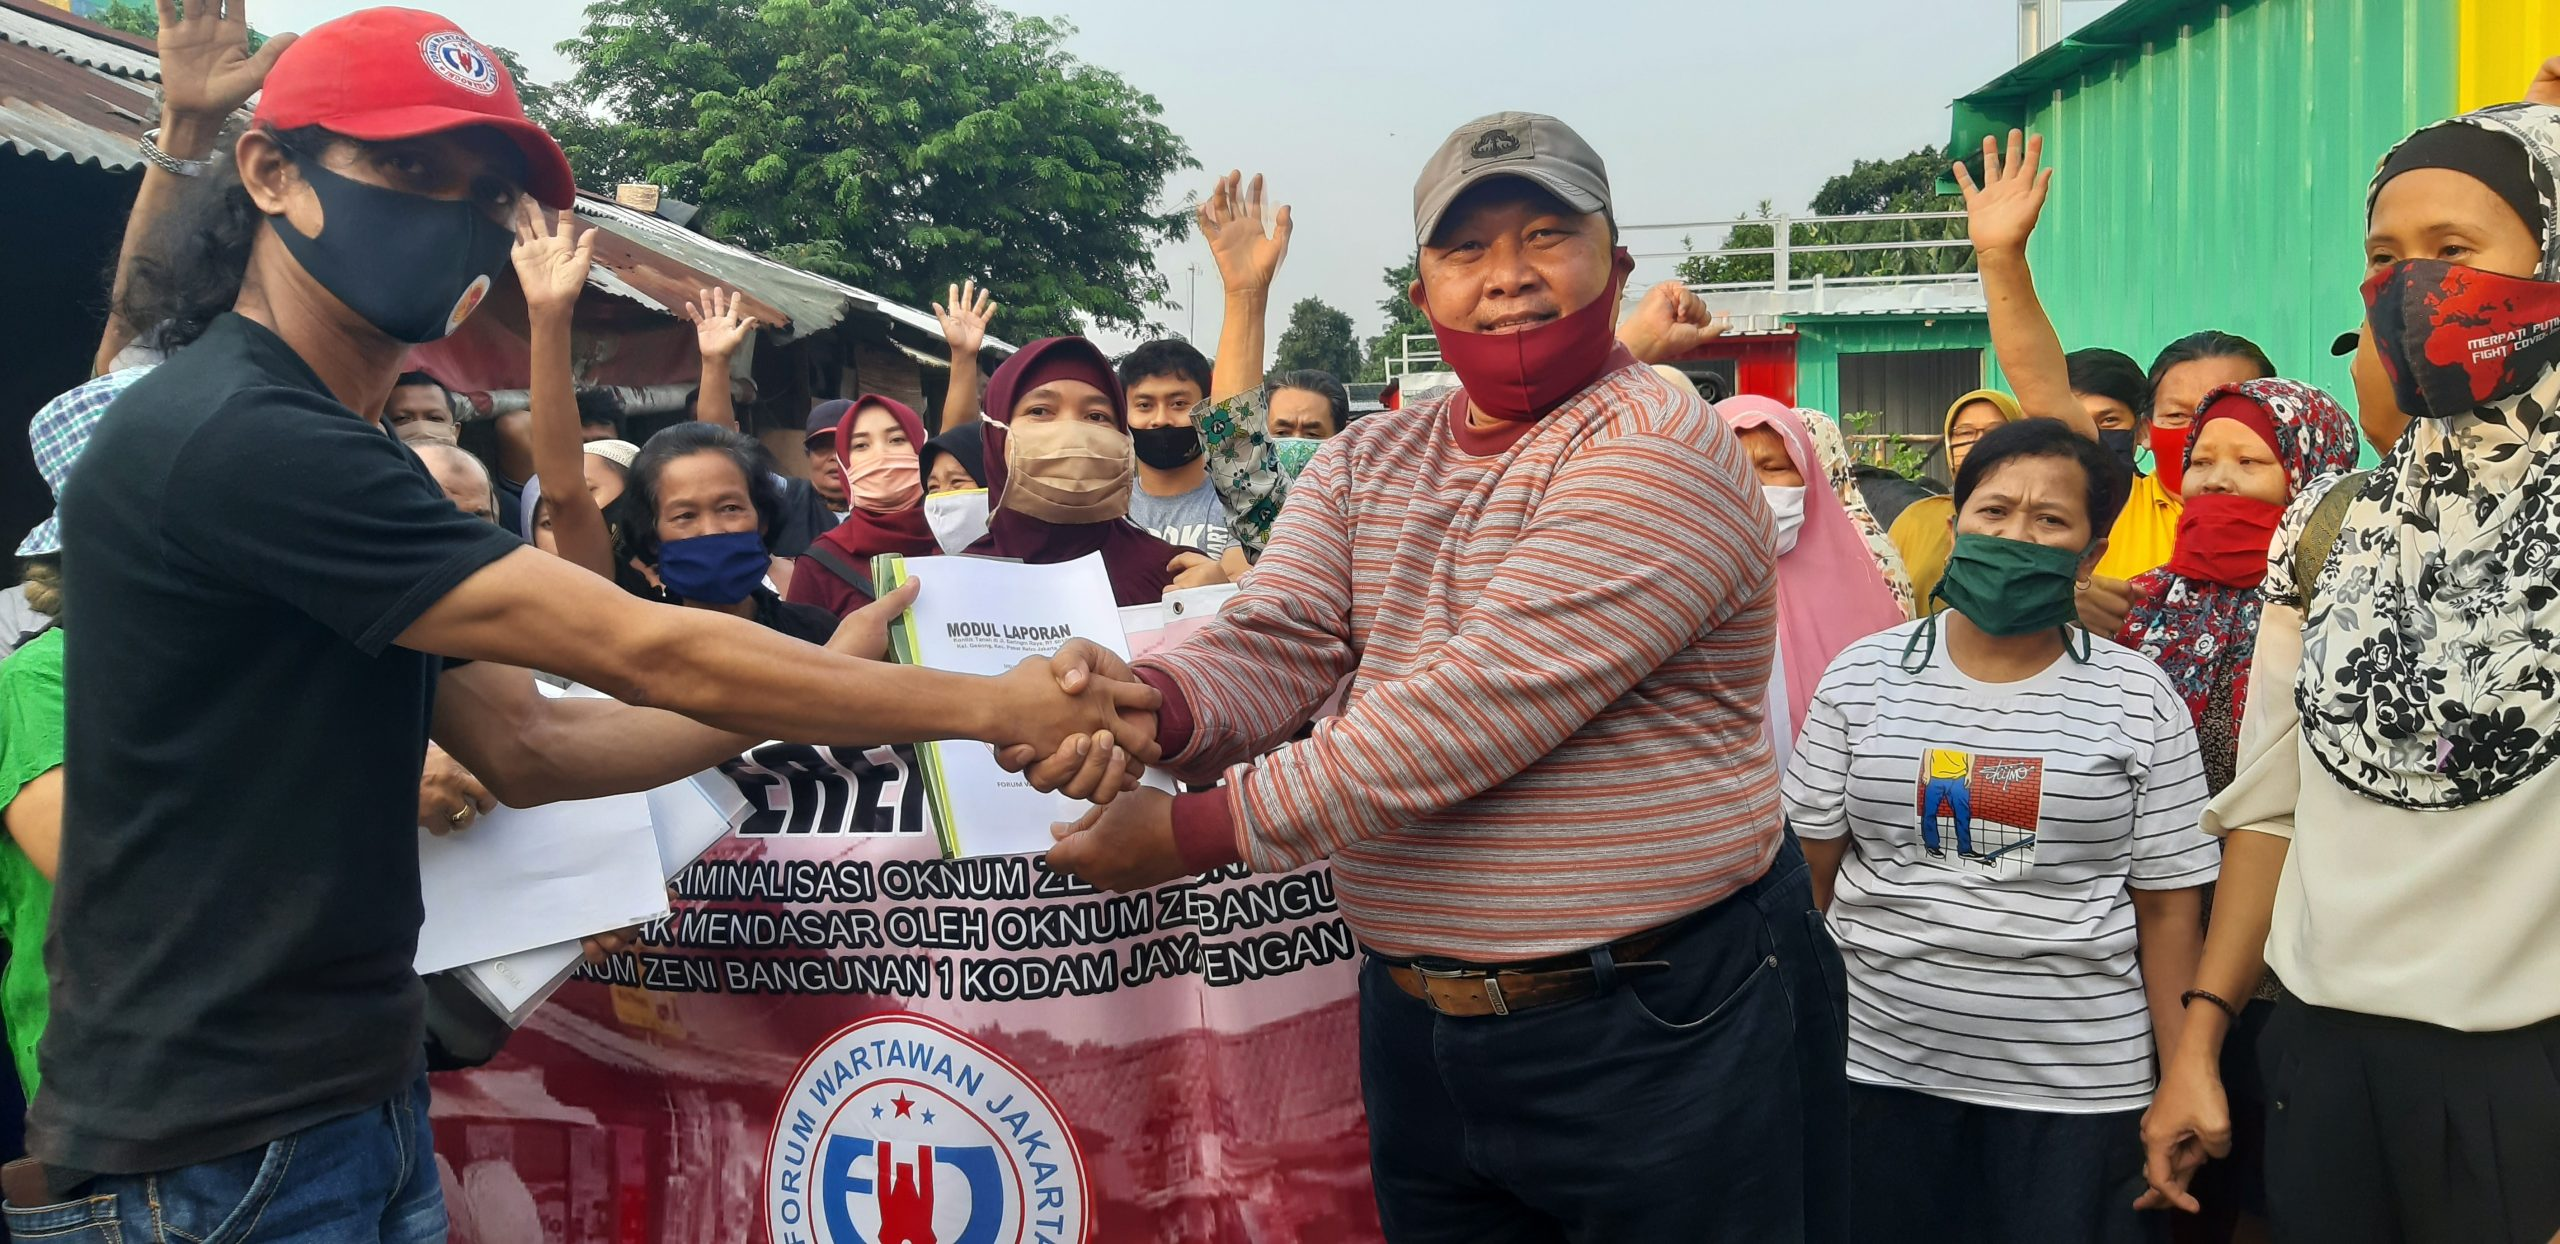 Dugaan Konspirasi Oknum Zeni Bang-1 Kodam Jaya Dengan PT. PSS Ancam Gusur 170 Pedagang Kreatif di Pasar Rebo